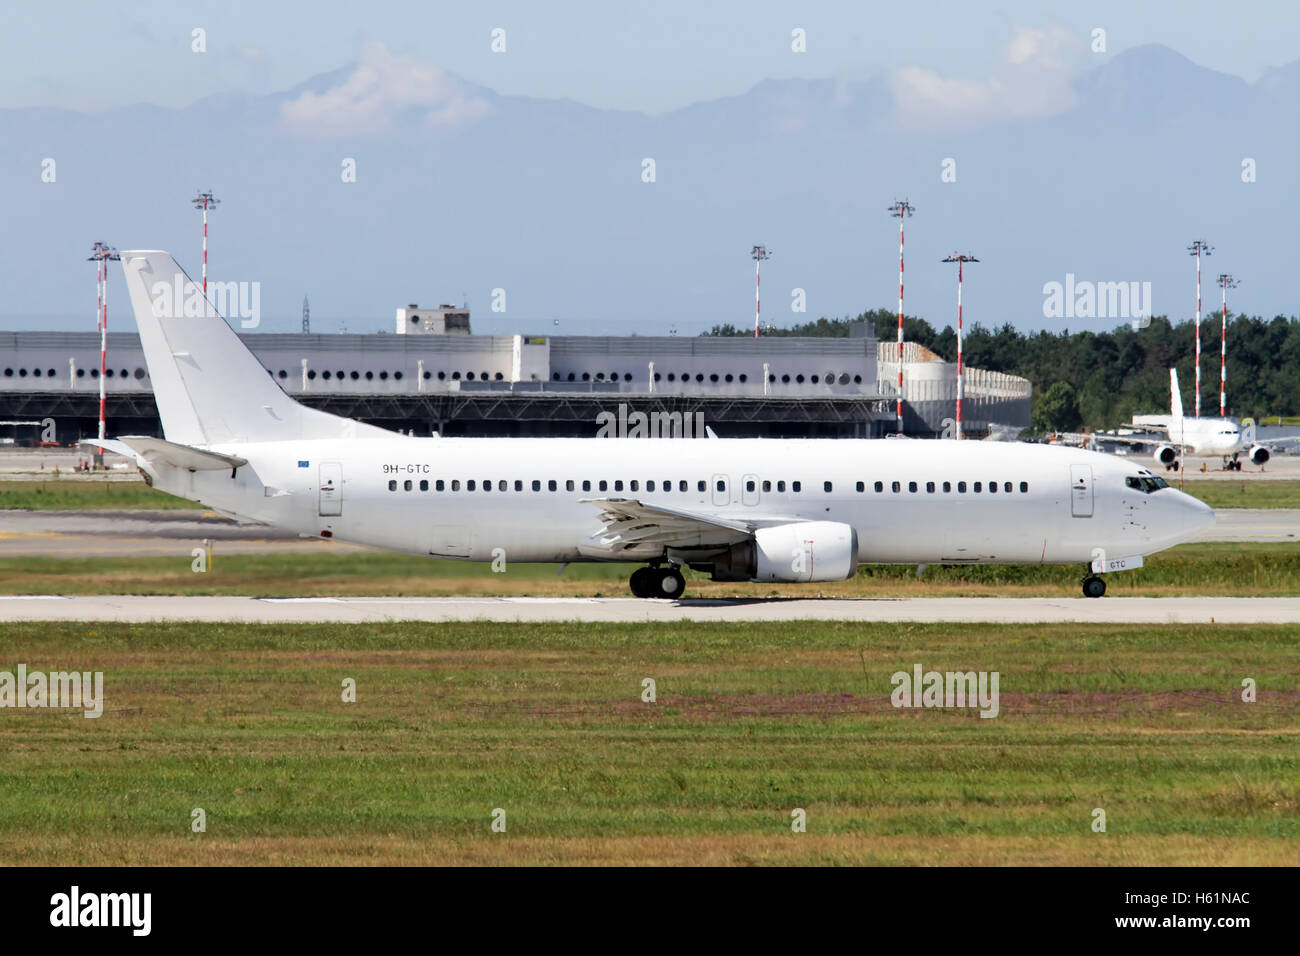 Air Horizont Boeing 737-430 Photographed at Malpensa airport, Milan, Italy (MXP / LIMC) - Stock Image